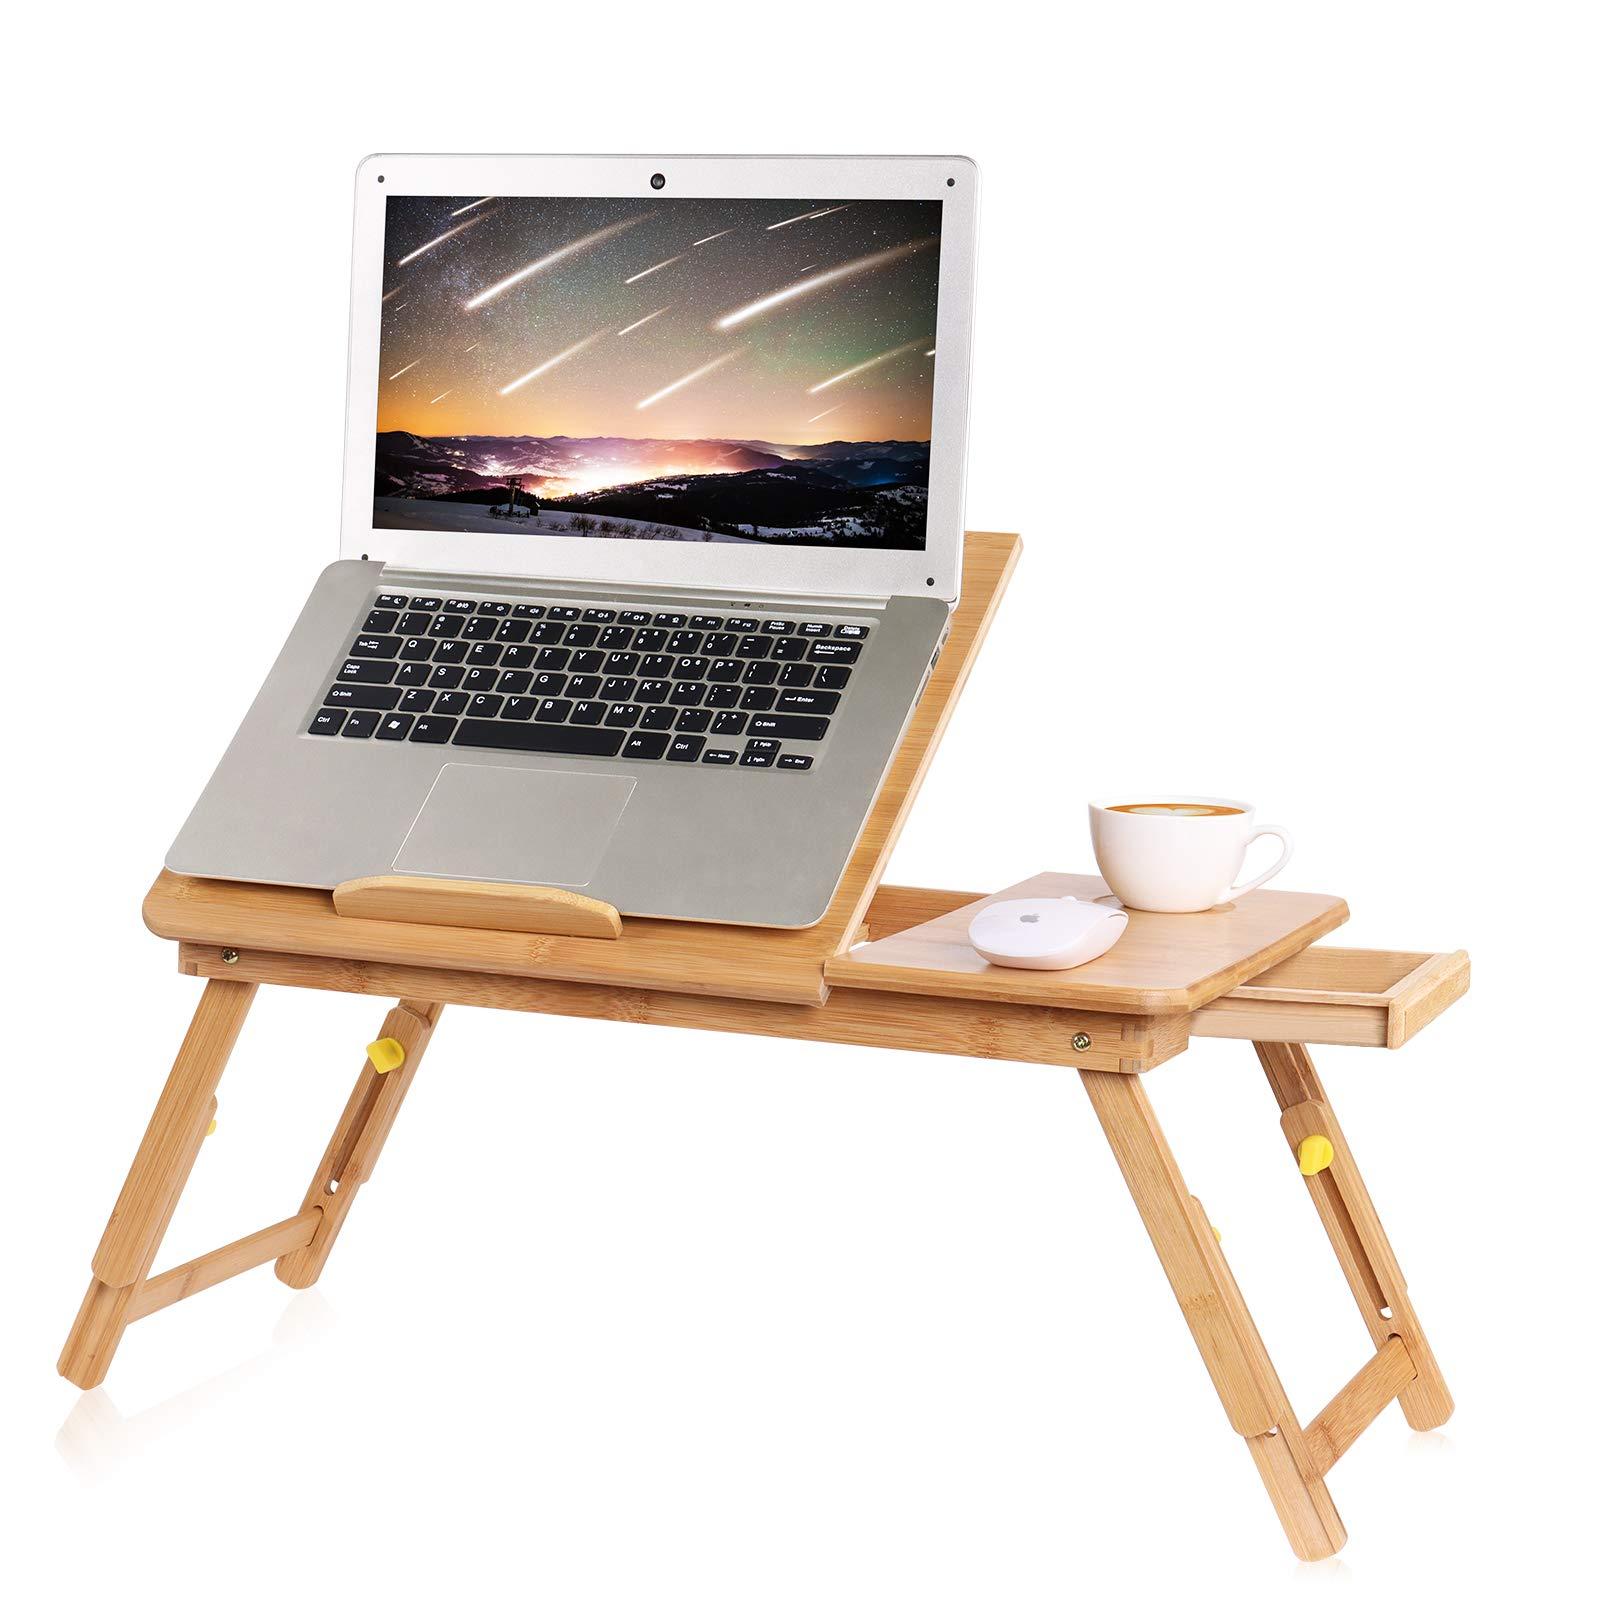 Mesa Plegable Para Notebook - Quonae - 8LH4VLZV